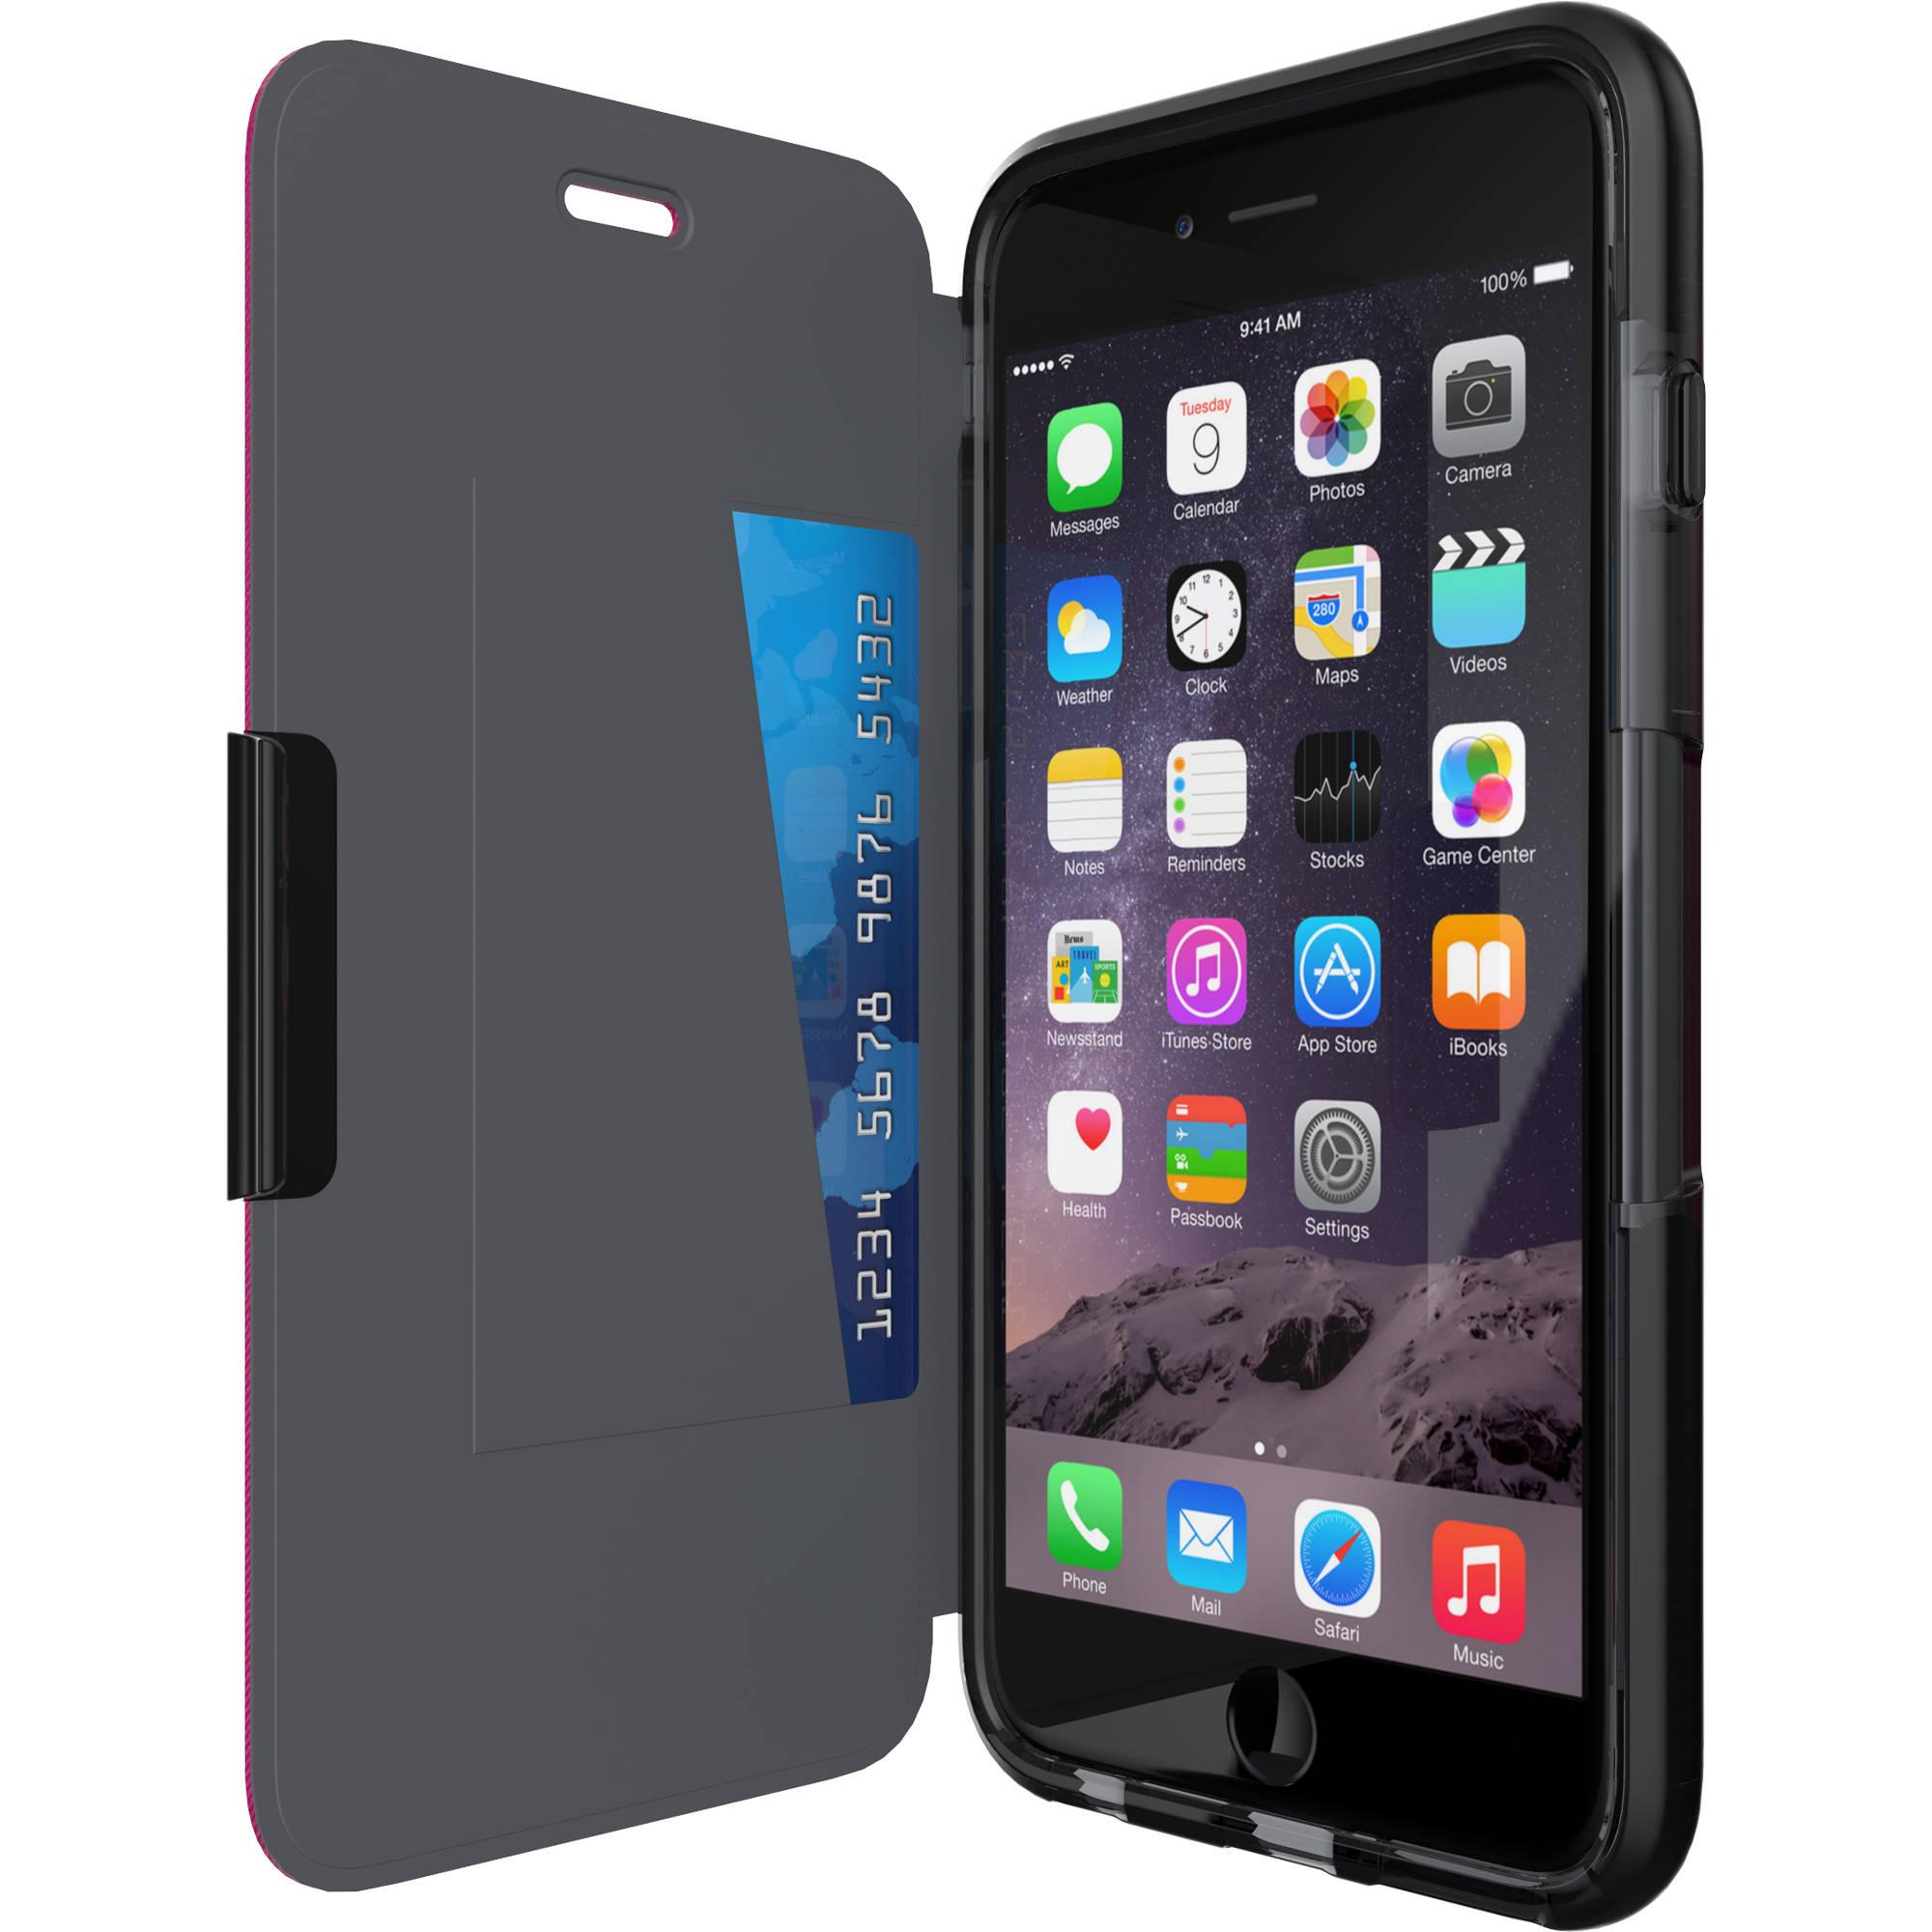 tech21 evo wallet case for iphone 6 plus black t21 5102 b h. Black Bedroom Furniture Sets. Home Design Ideas